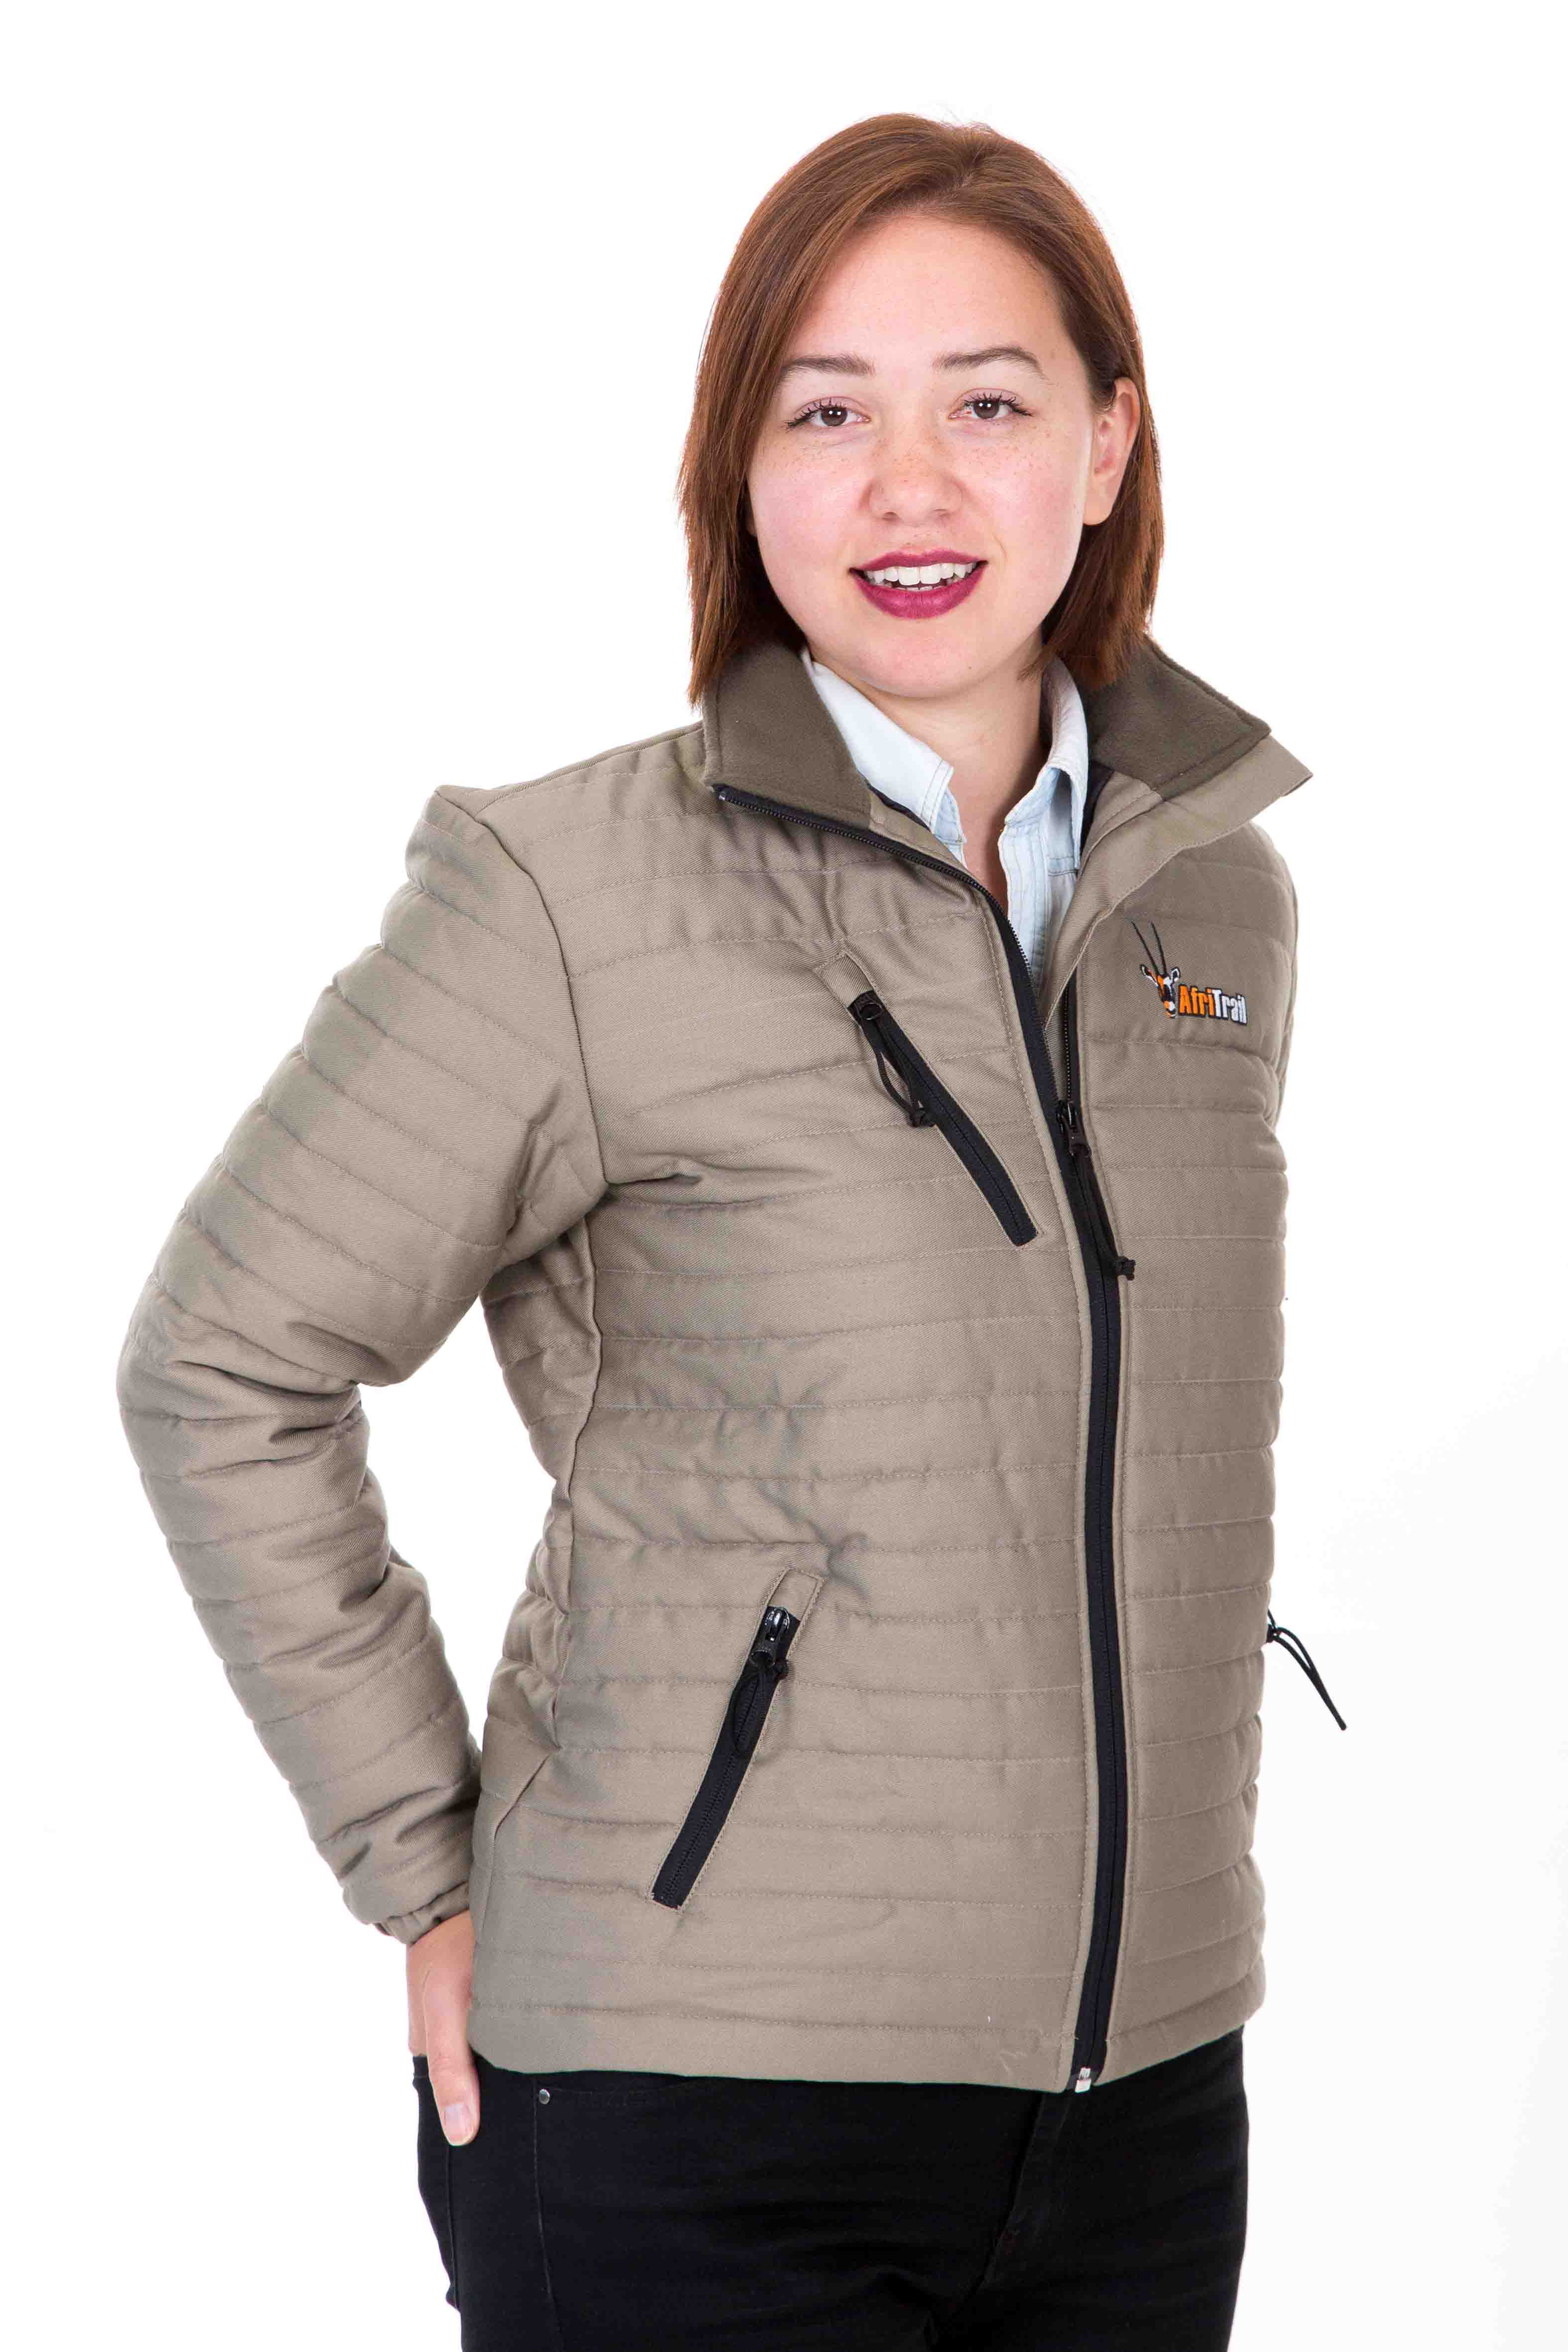 afritrail-pc-twill-women's-jacket